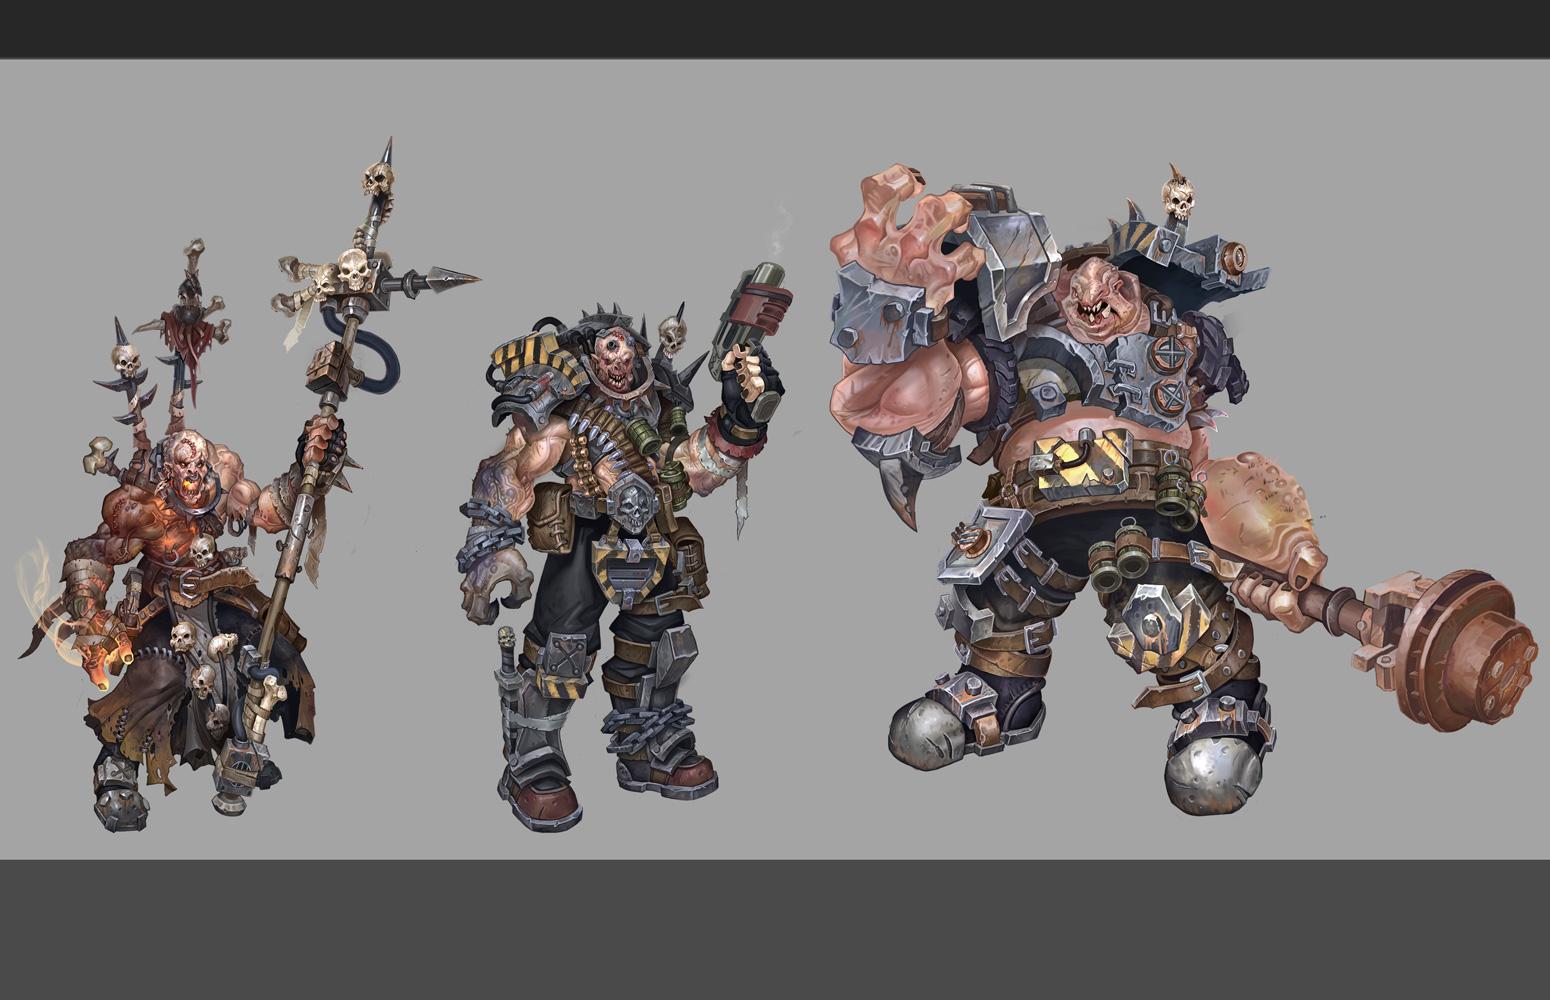 [E3] Eternal Crusade, un MMO Warhammer 40K - Page 3 12